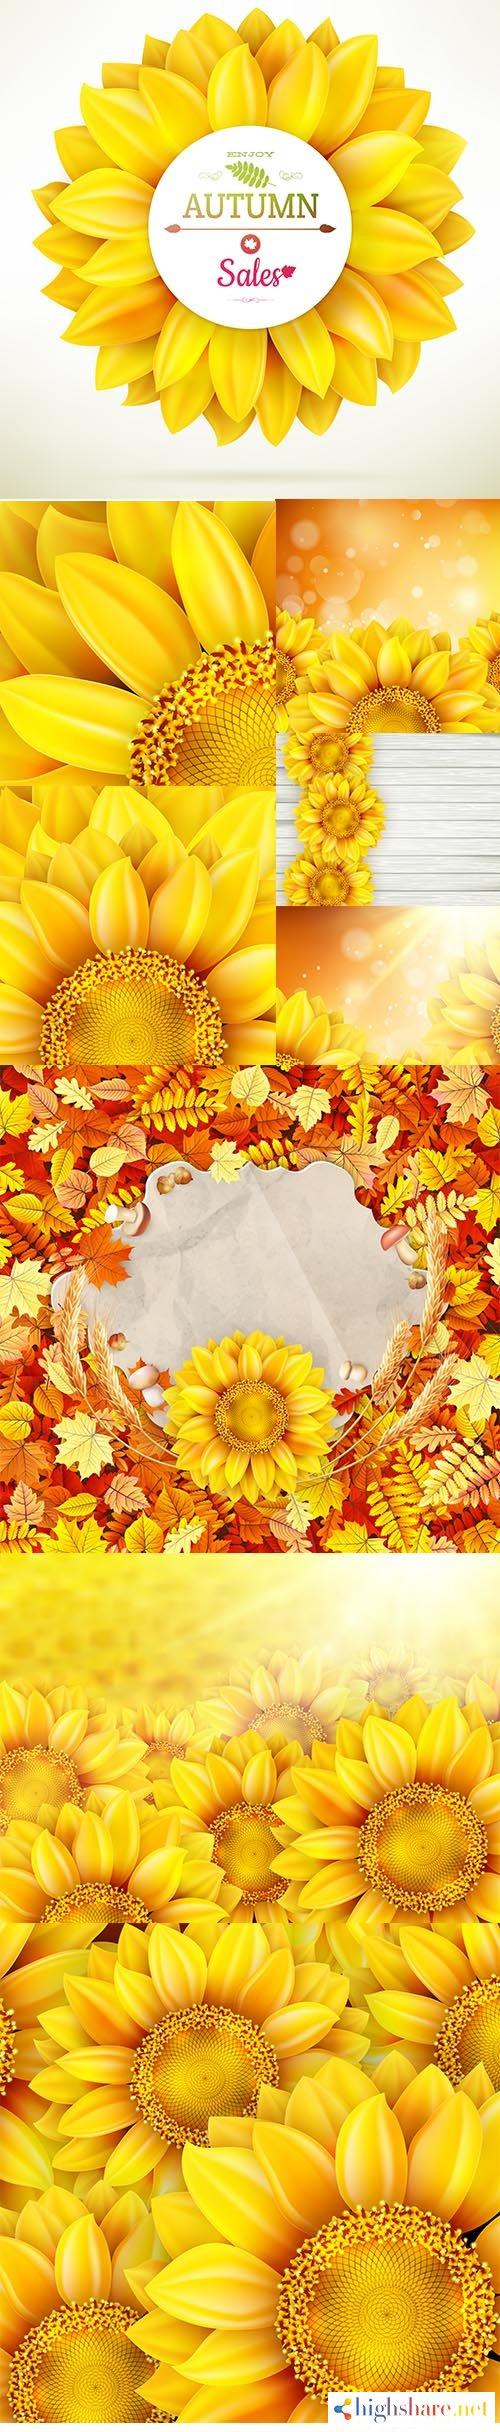 sunflower high quality illustration 5f409db61d800 - Sunflower High Quality Illustration